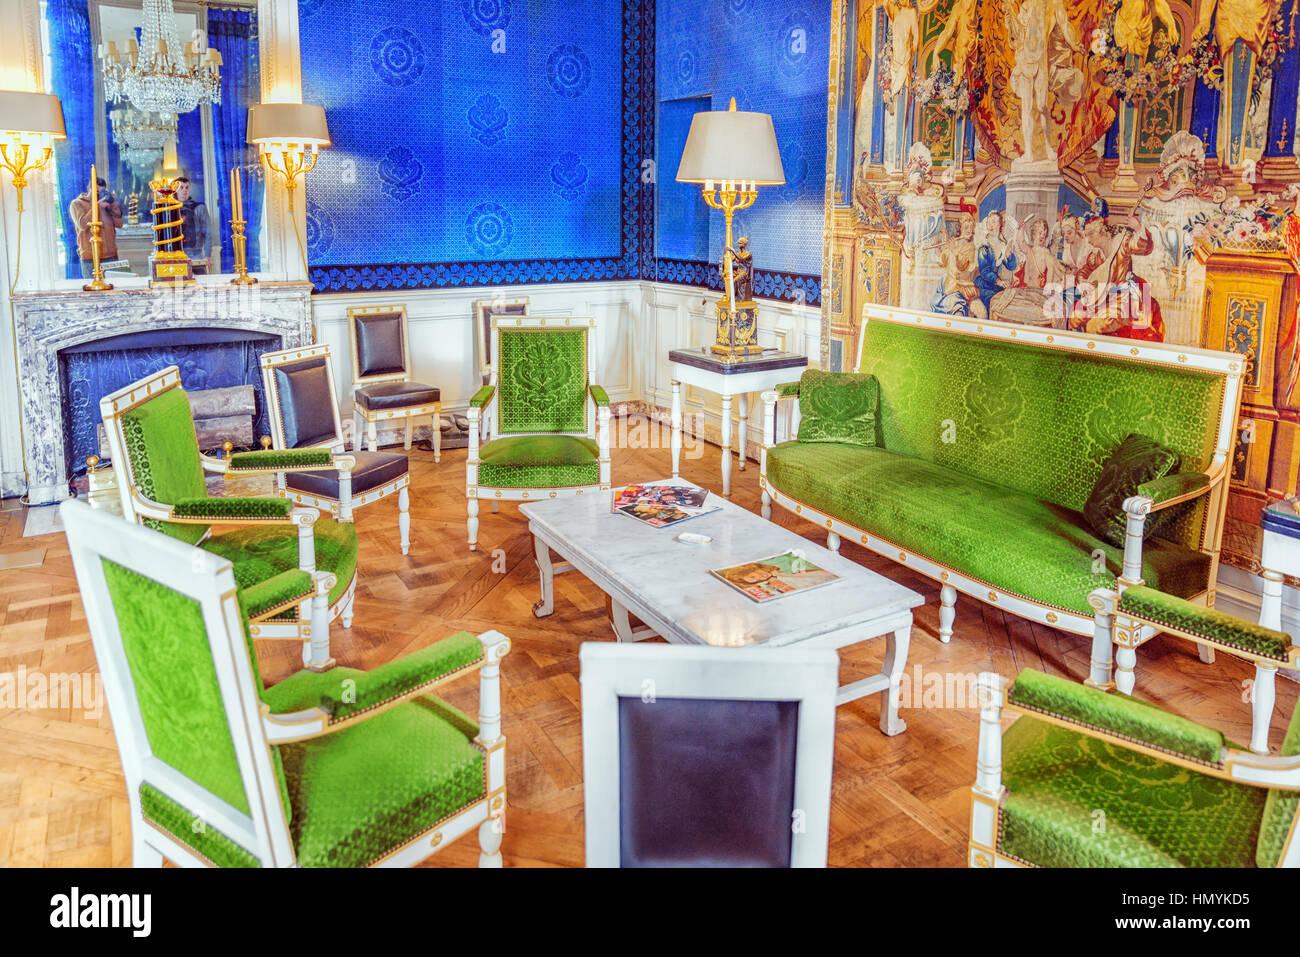 Grand trianon stock photos grand trianon stock images alamy - Cabinet mansart versailles ...